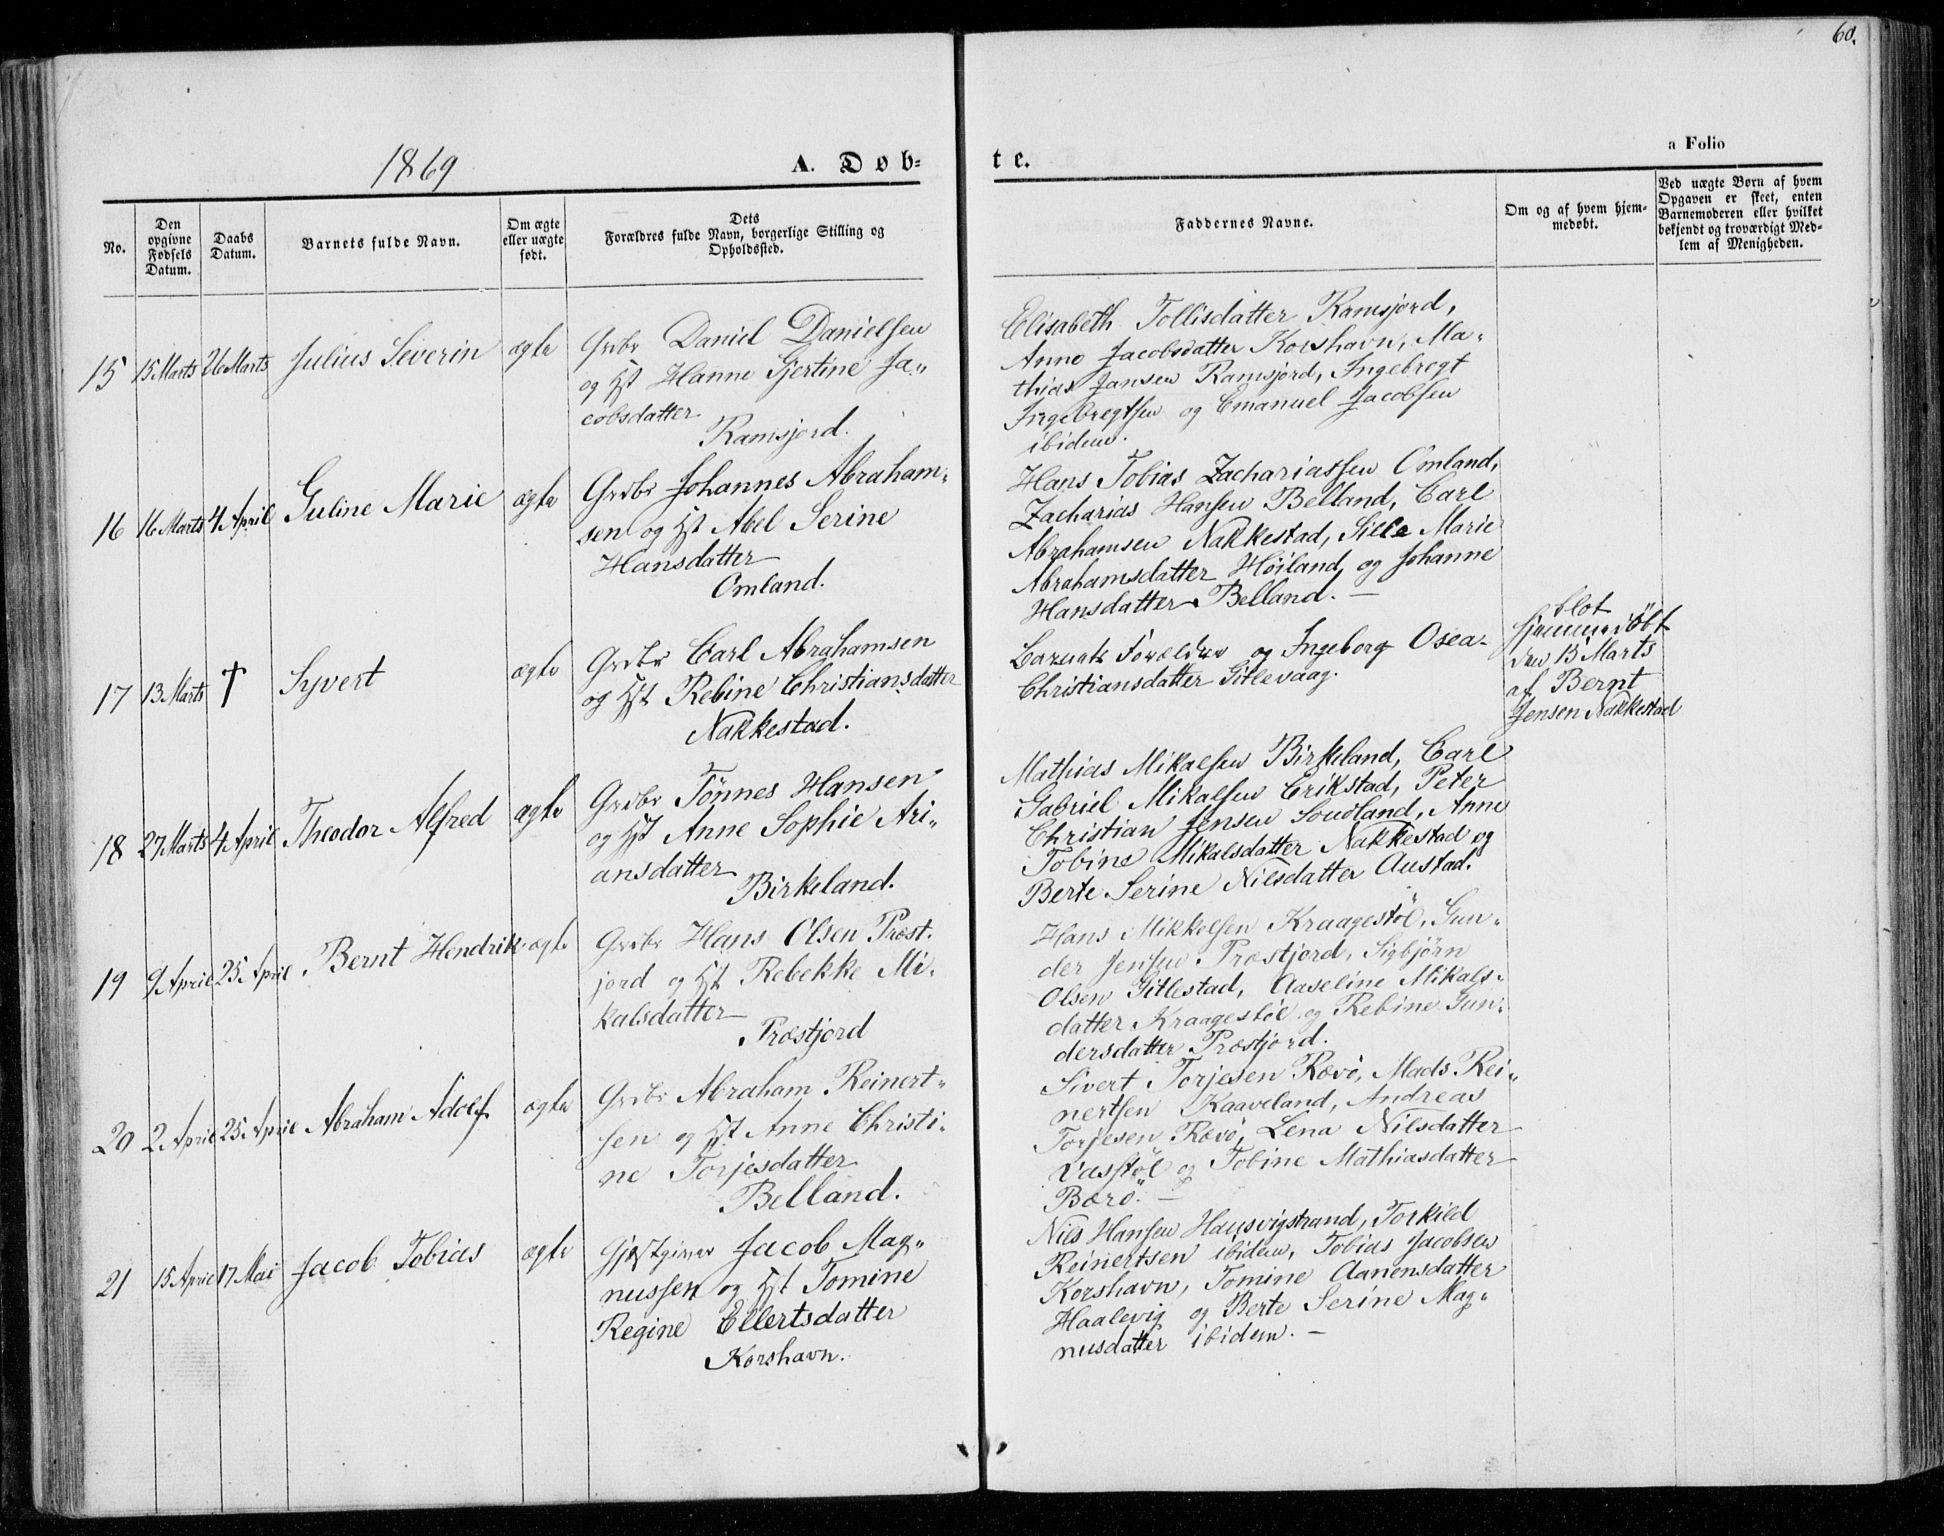 SAK, Lyngdal sokneprestkontor, F/Fa/Faa/L0002: Ministerialbok nr. A 2, 1858-1870, s. 60